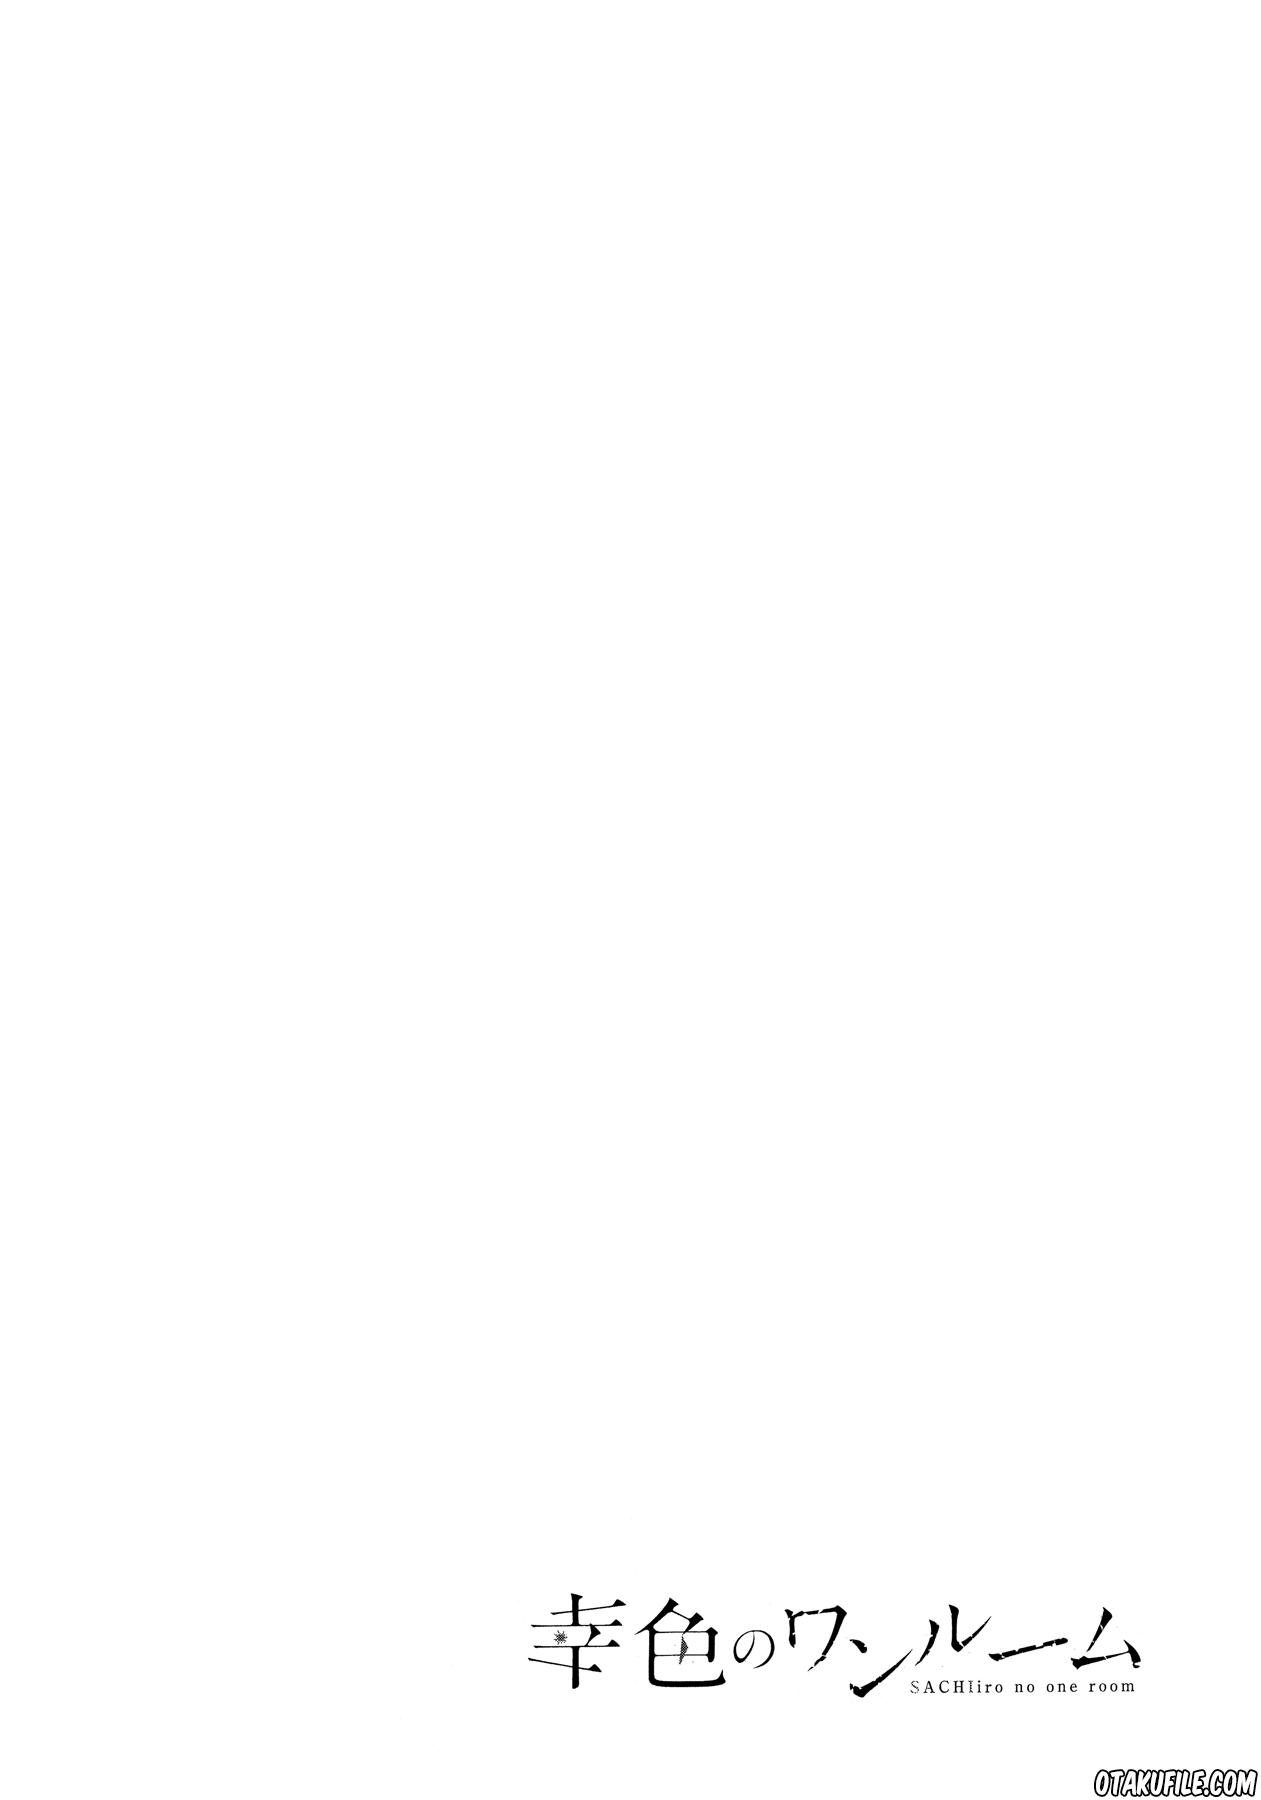 Dilarang COPAS - situs resmi www.mangacanblog.com - Komik sachi iro no one room 015 - chapter 15 16 Indonesia sachi iro no one room 015 - chapter 15 Terbaru 16 Baca Manga Komik Indonesia Mangacan